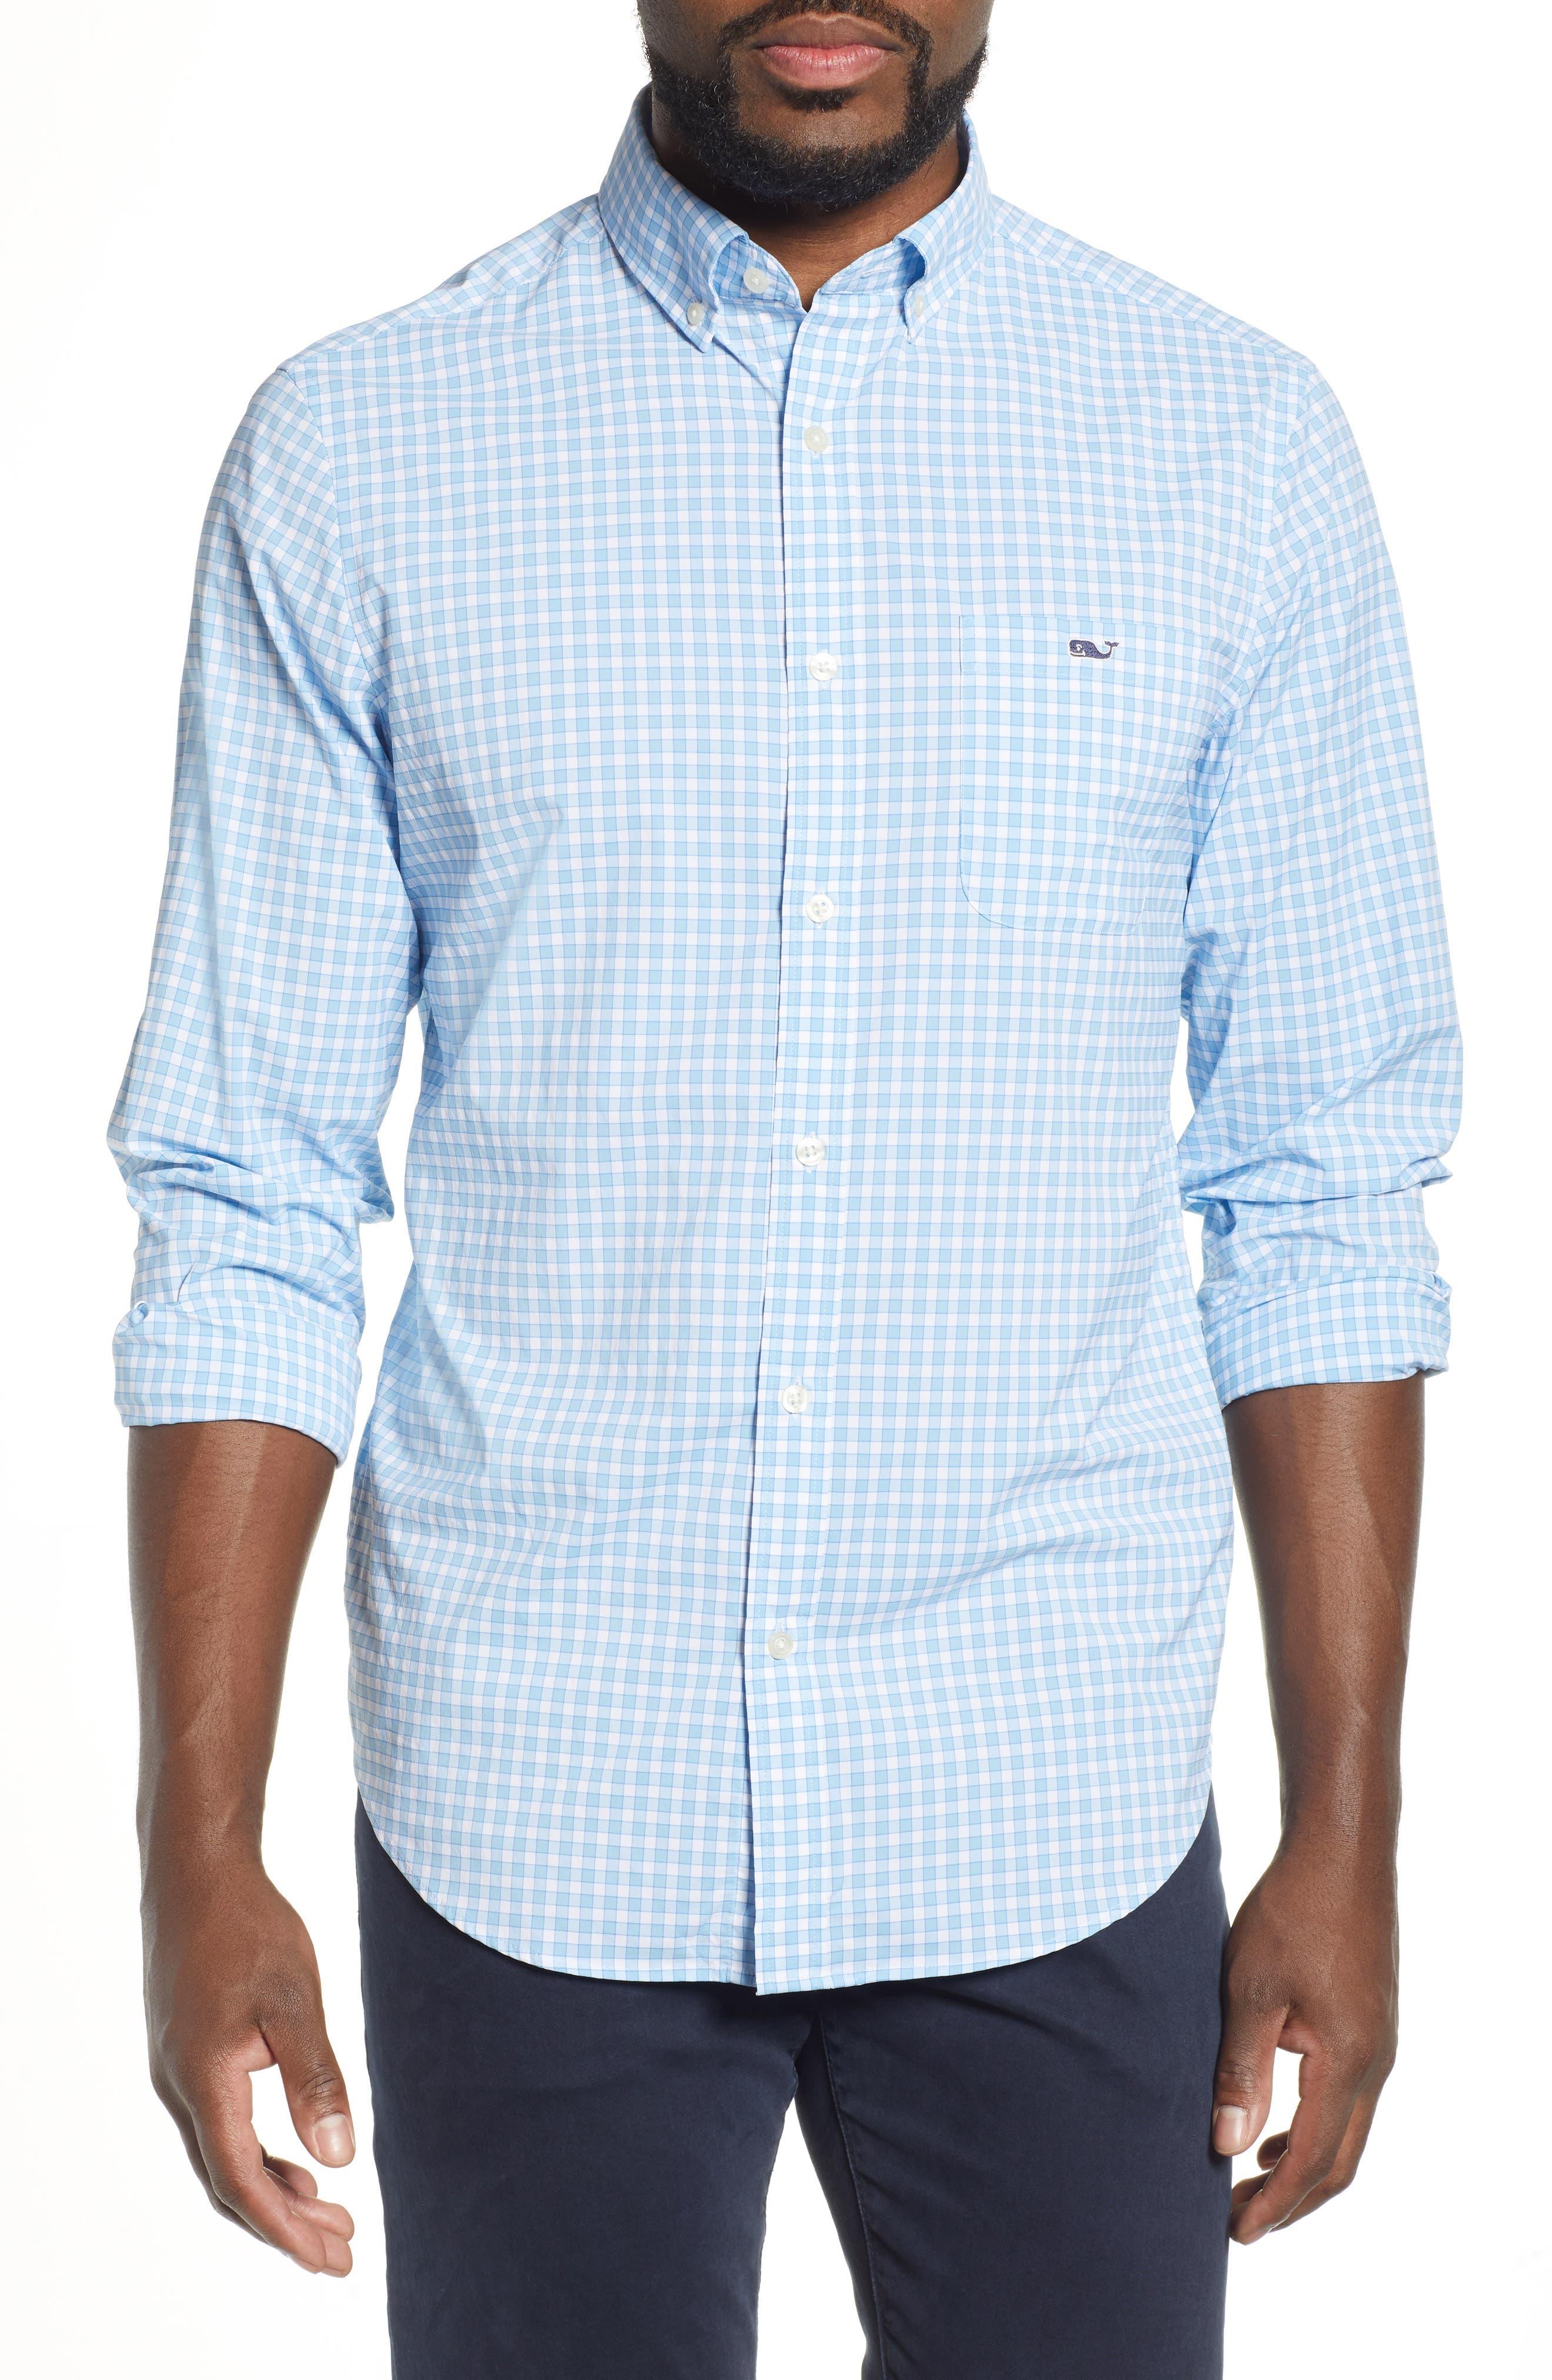 Bermuda Tucker Regular Fit Performance Sport Shirt, Main, color, JAKE BLUE